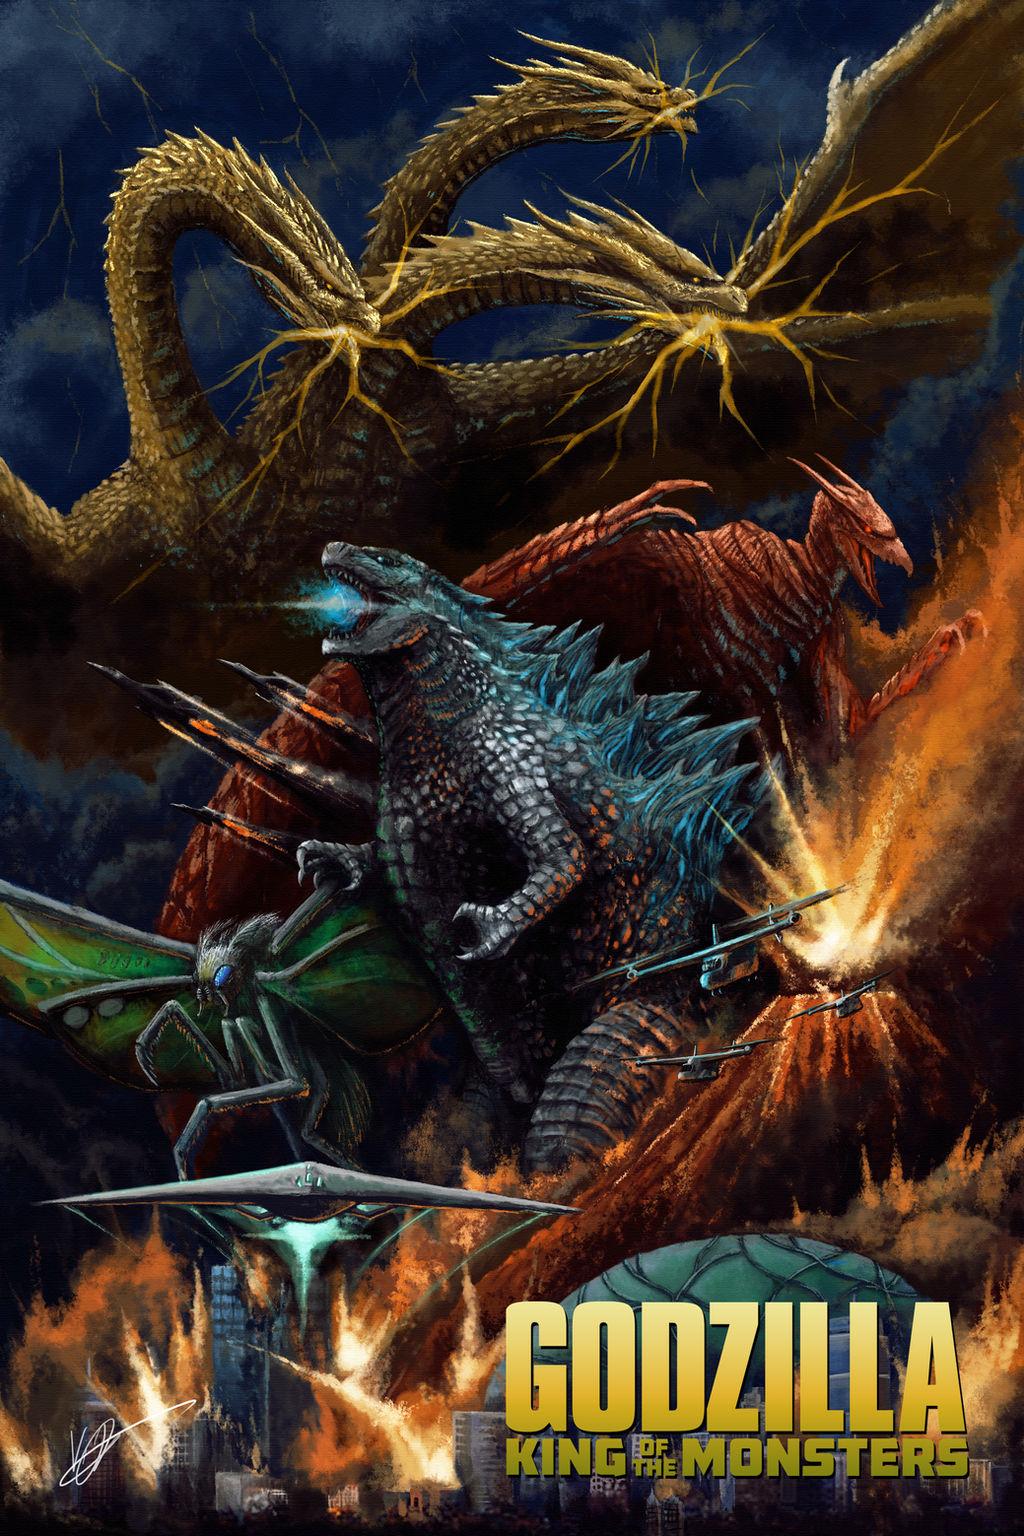 Godzilla King Of The Monsters 2019 Full Poster By Phaz0ngoji On Deviantart